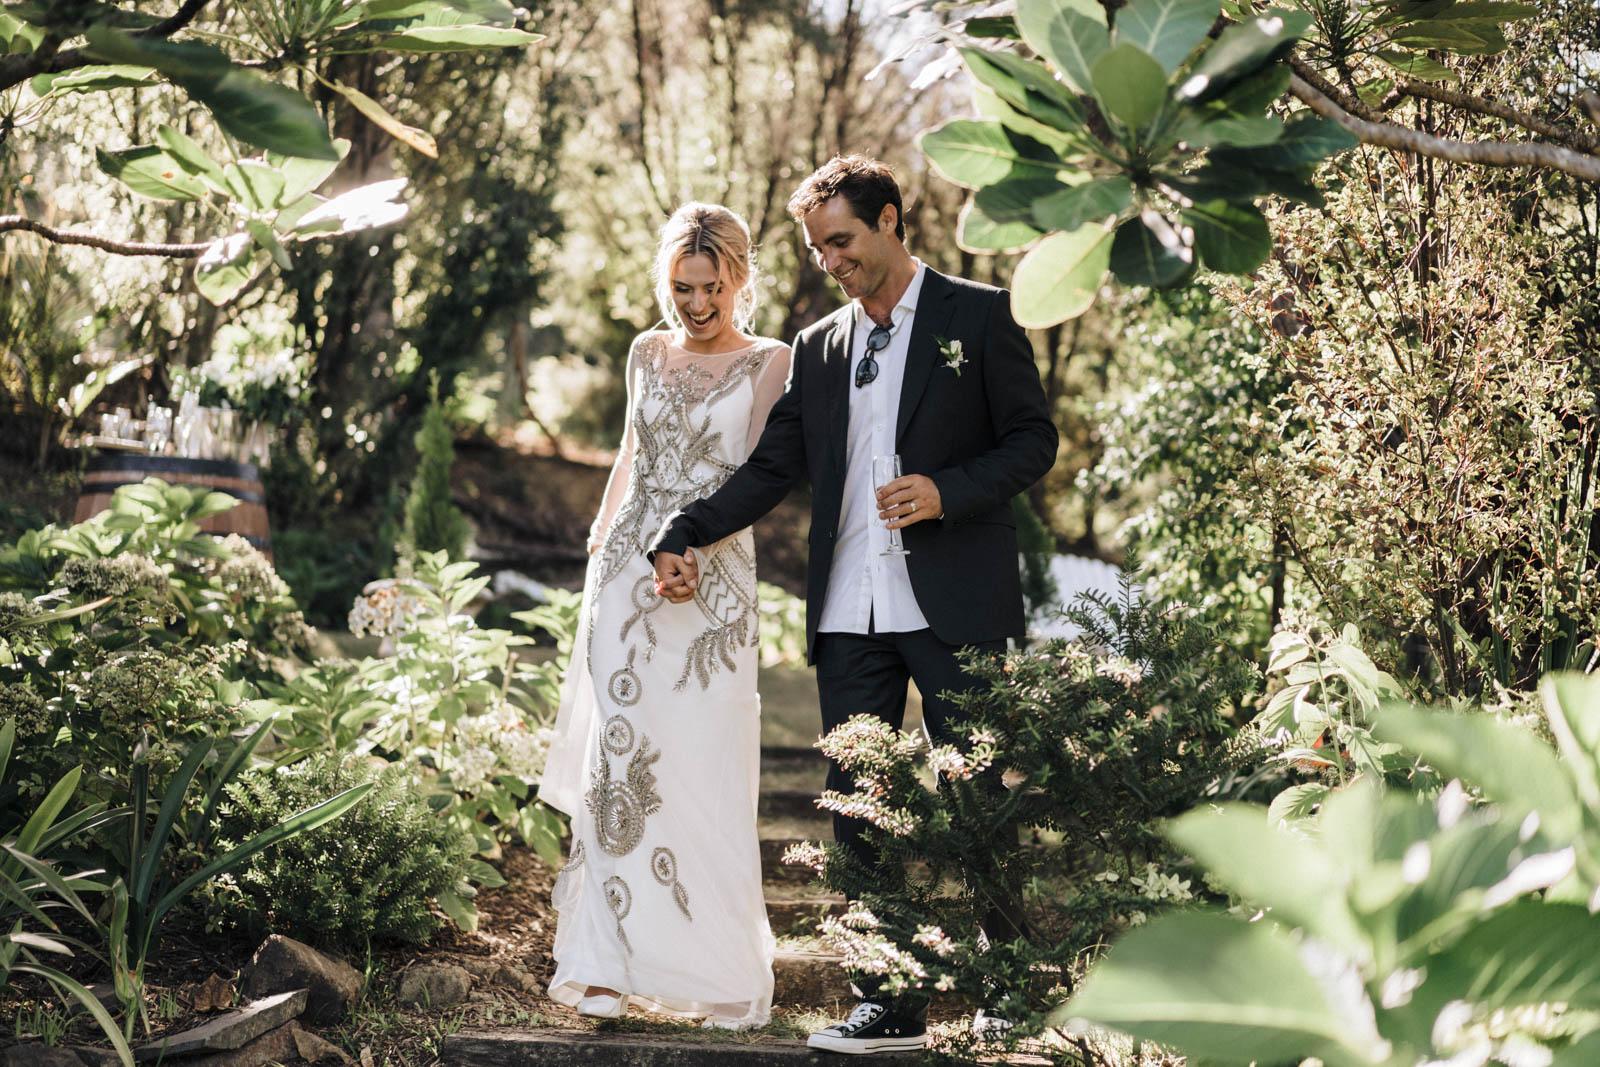 newfound-l-i-coromandel-wedding-photographer-1712-A9_03608